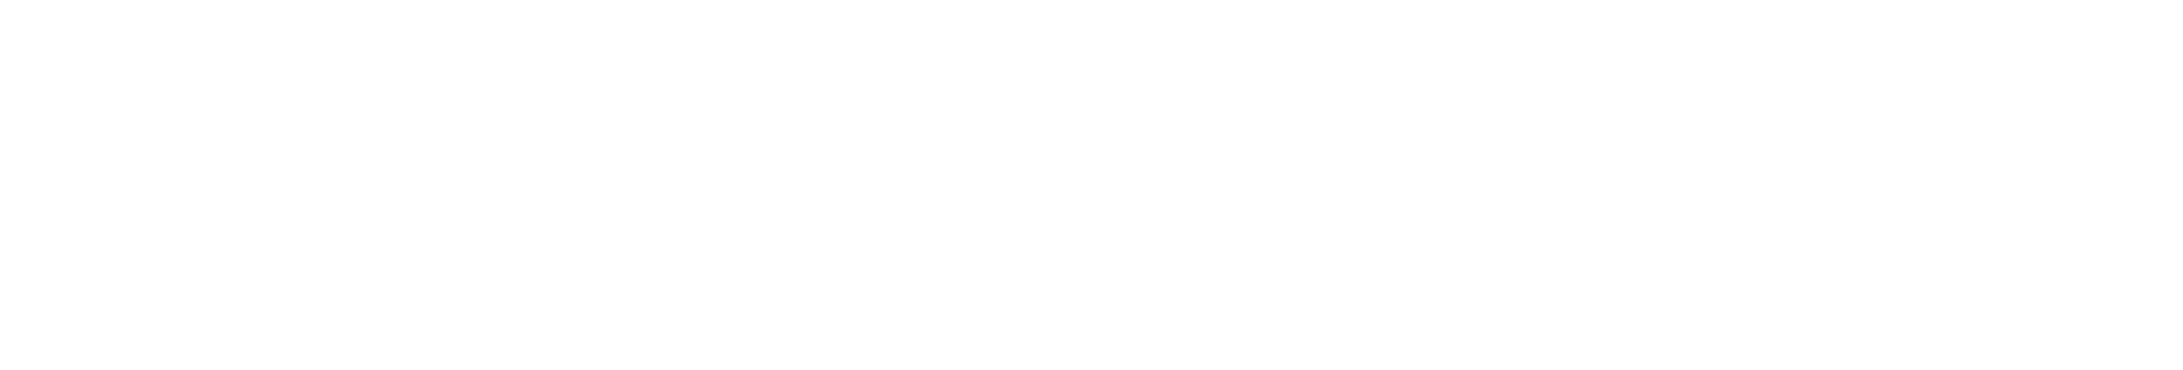 safecap-icon